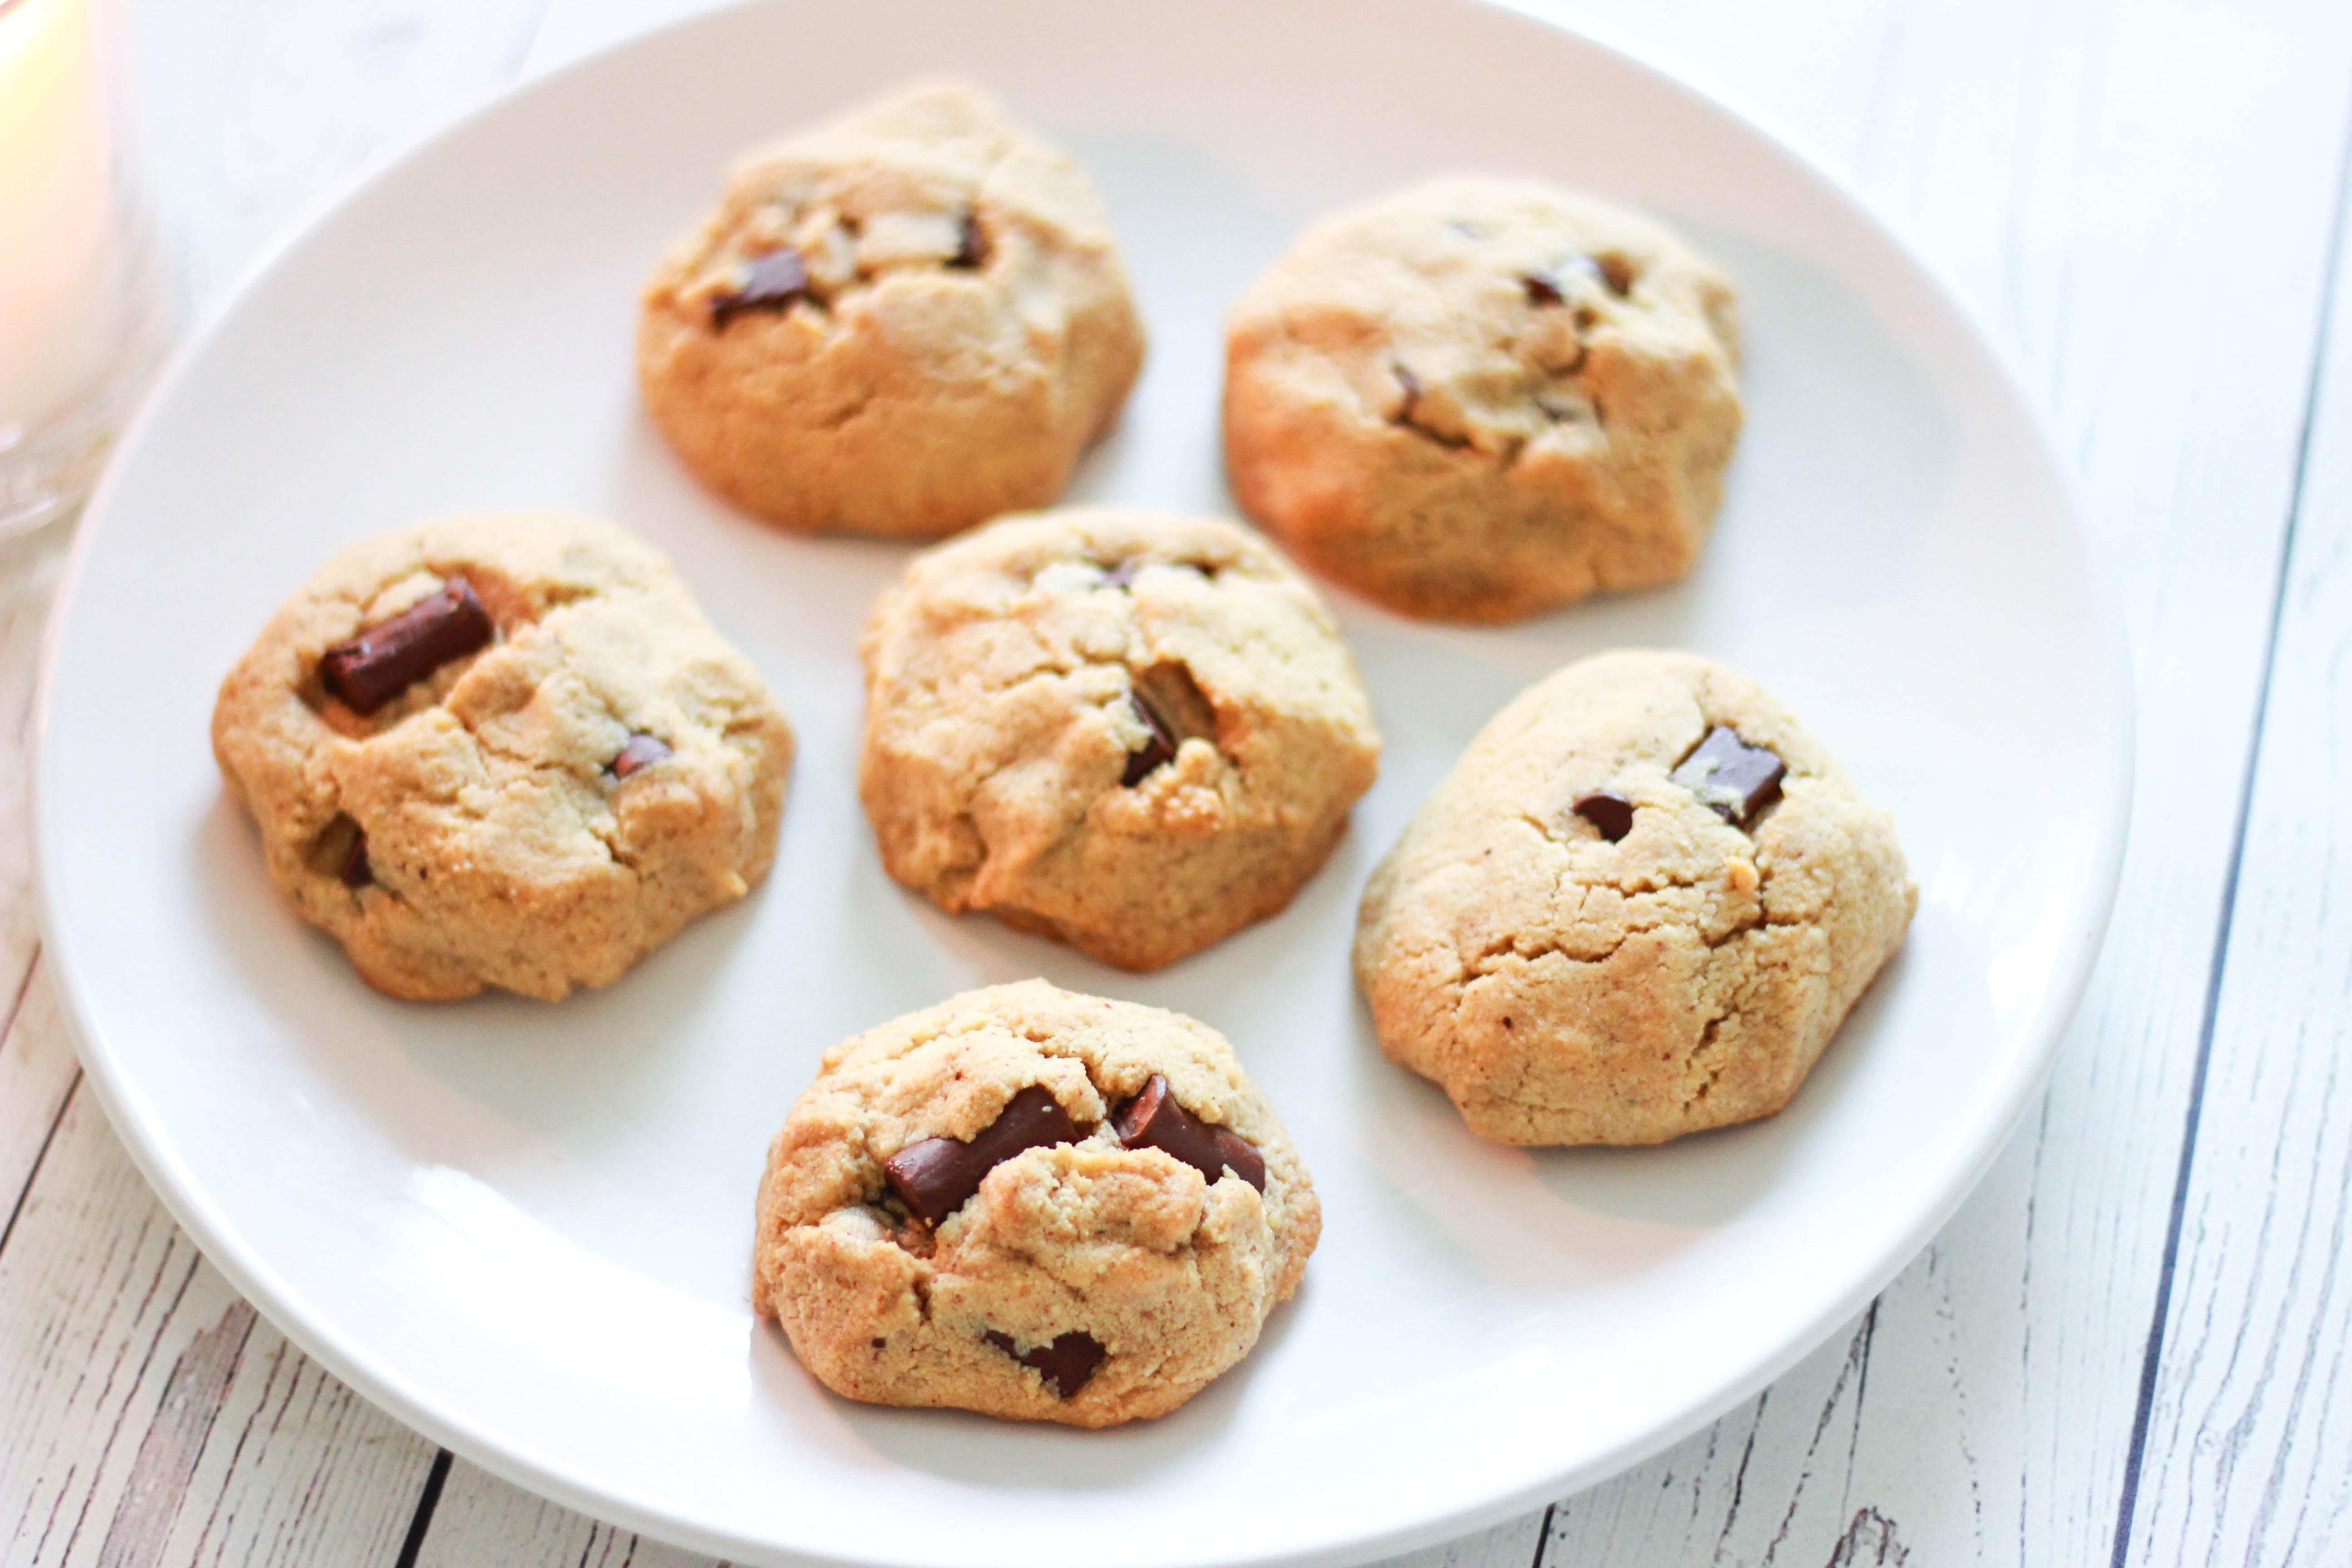 Classic Paleo Chocolate Chip Cookies